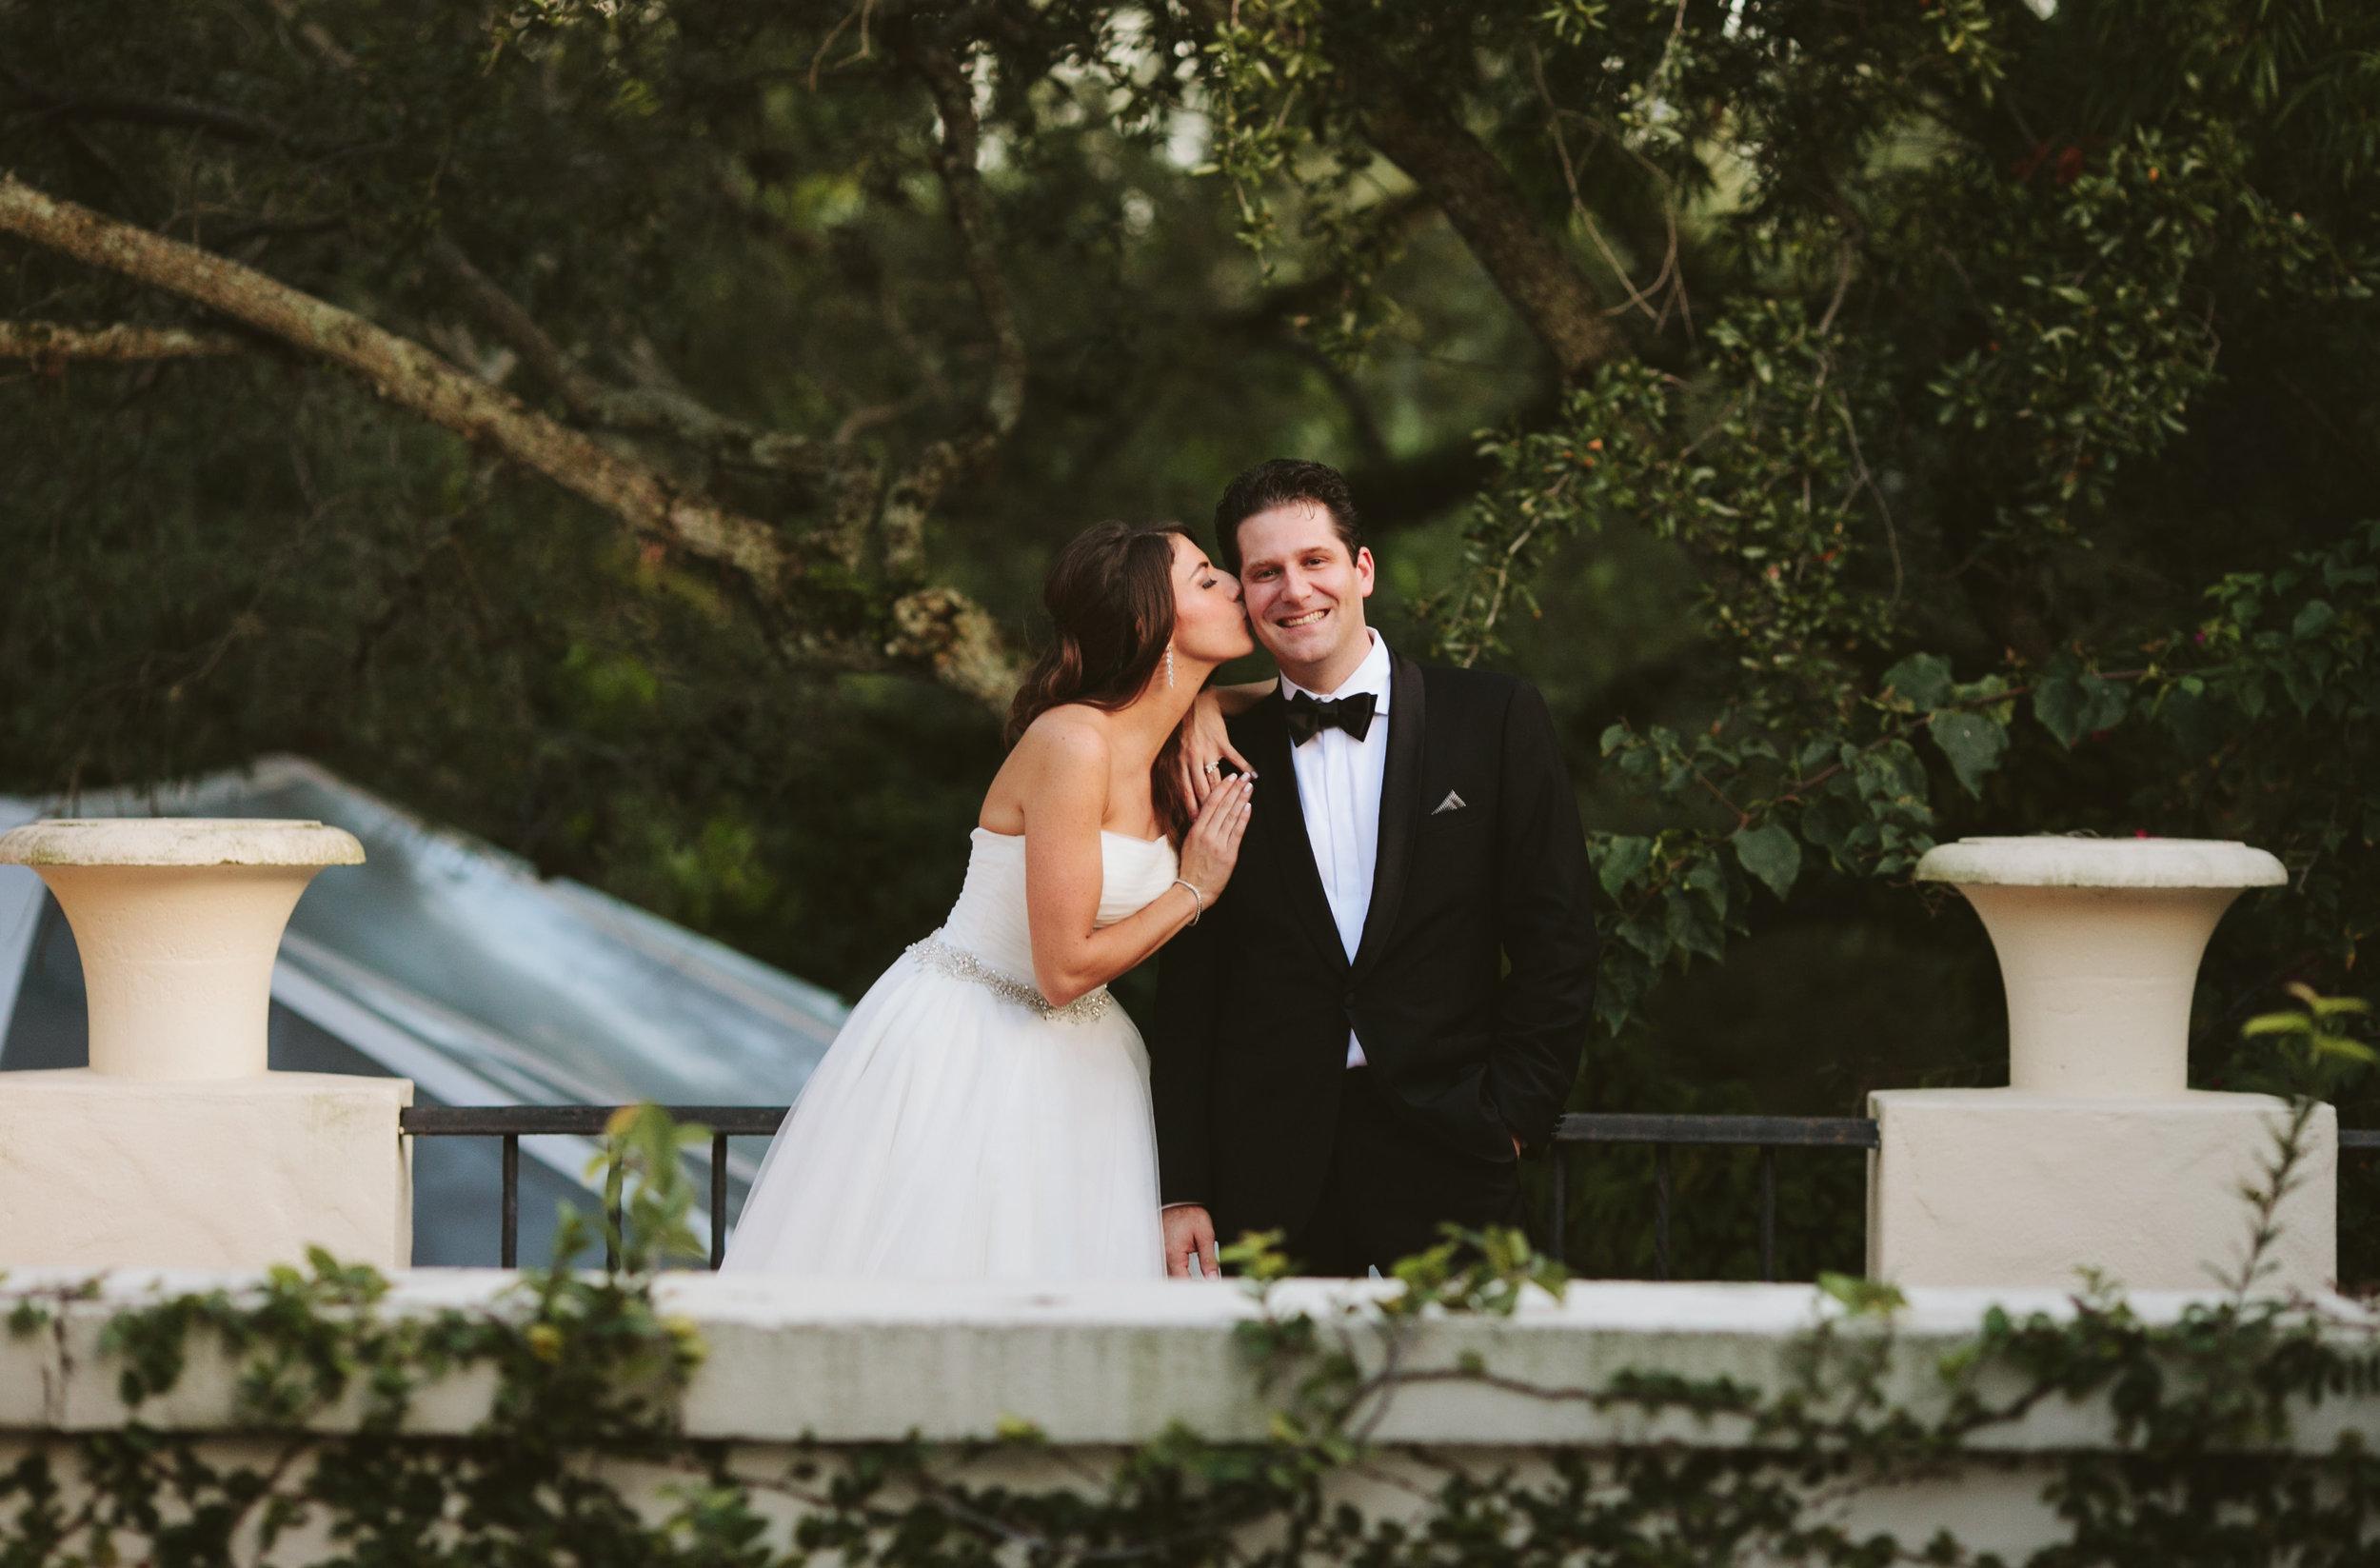 Meli + Mike Coconut Grove Wedding at Villa Woodbine36.jpg